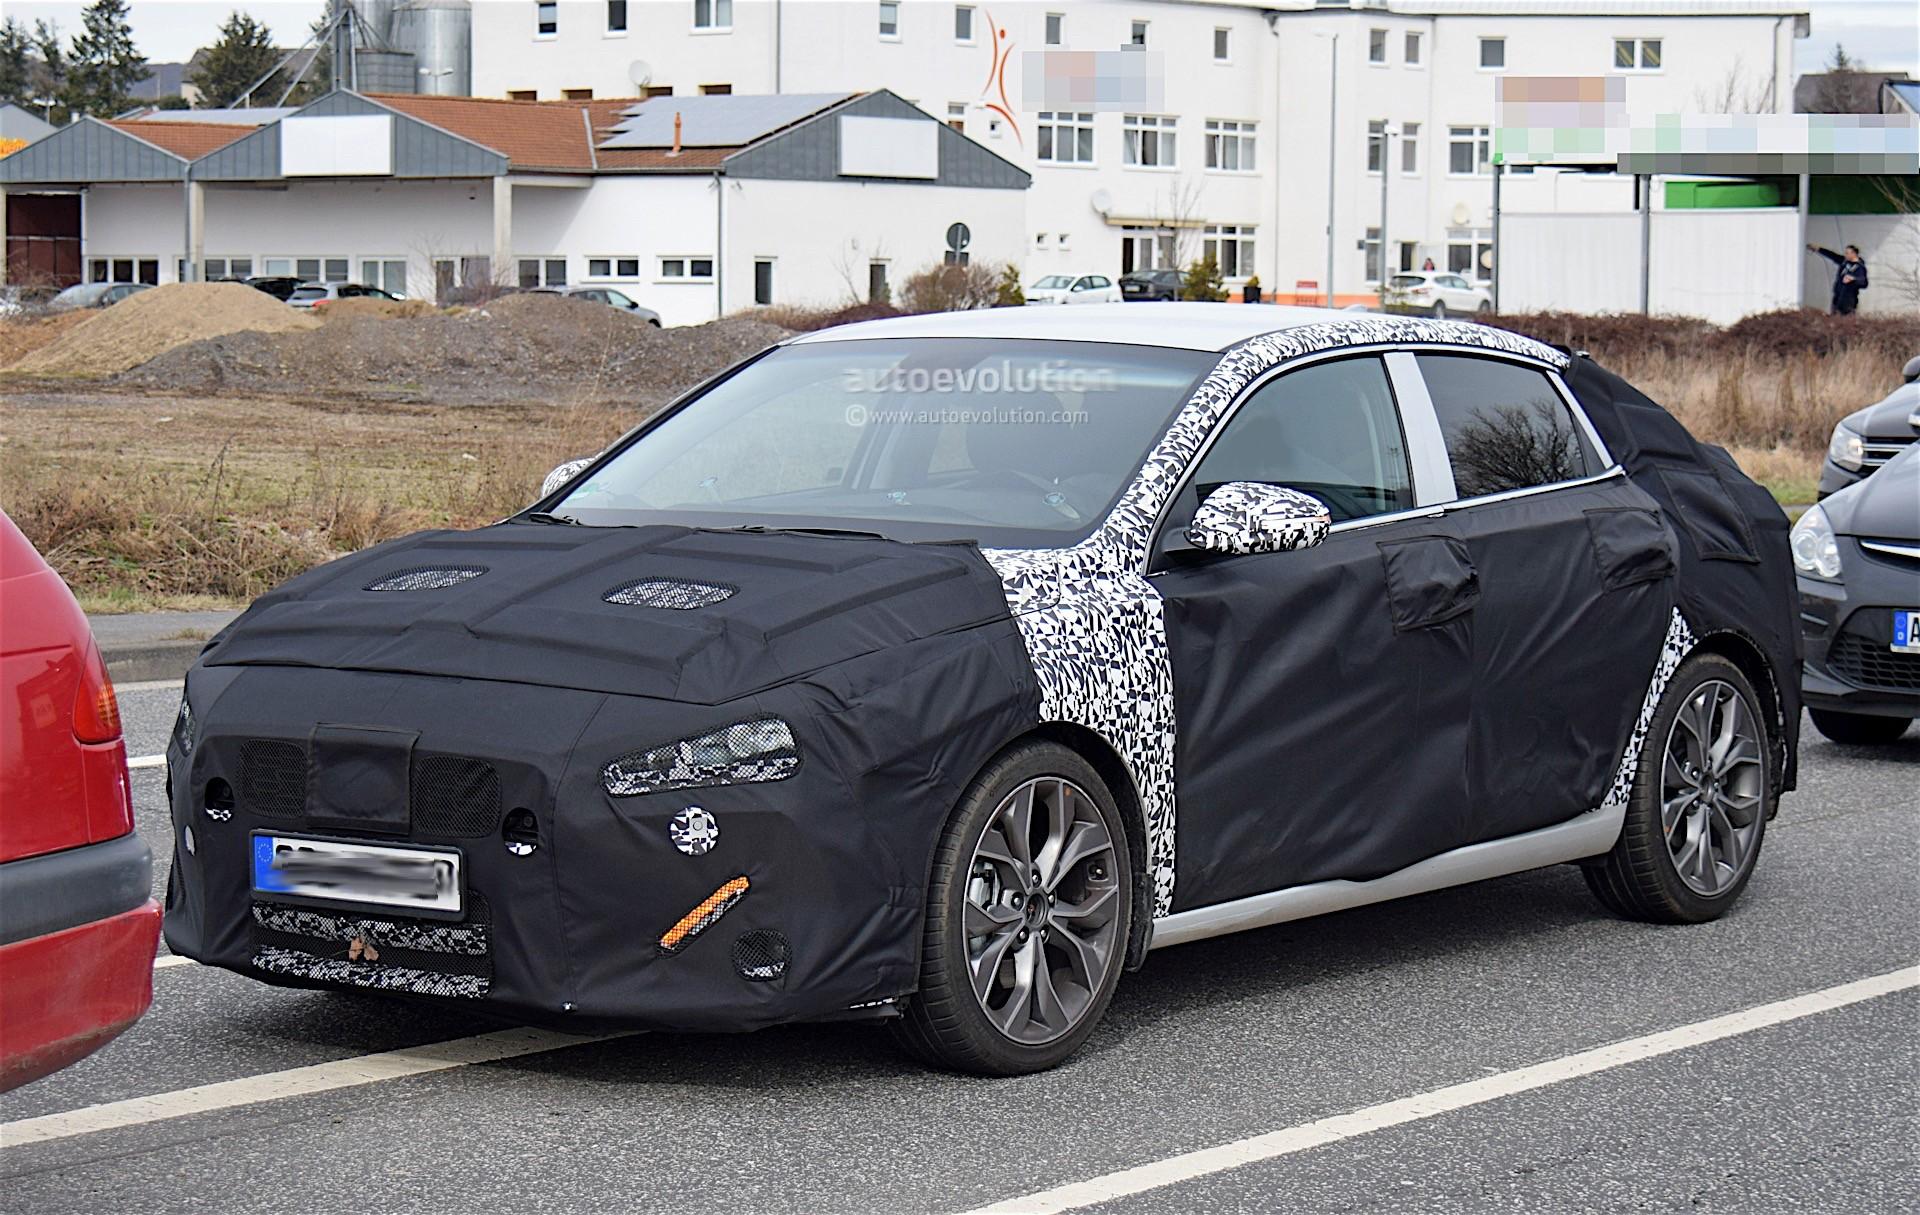 2018 hyundai fastback. modren hyundai hyundai i30 fastback prototype  throughout 2018 hyundai